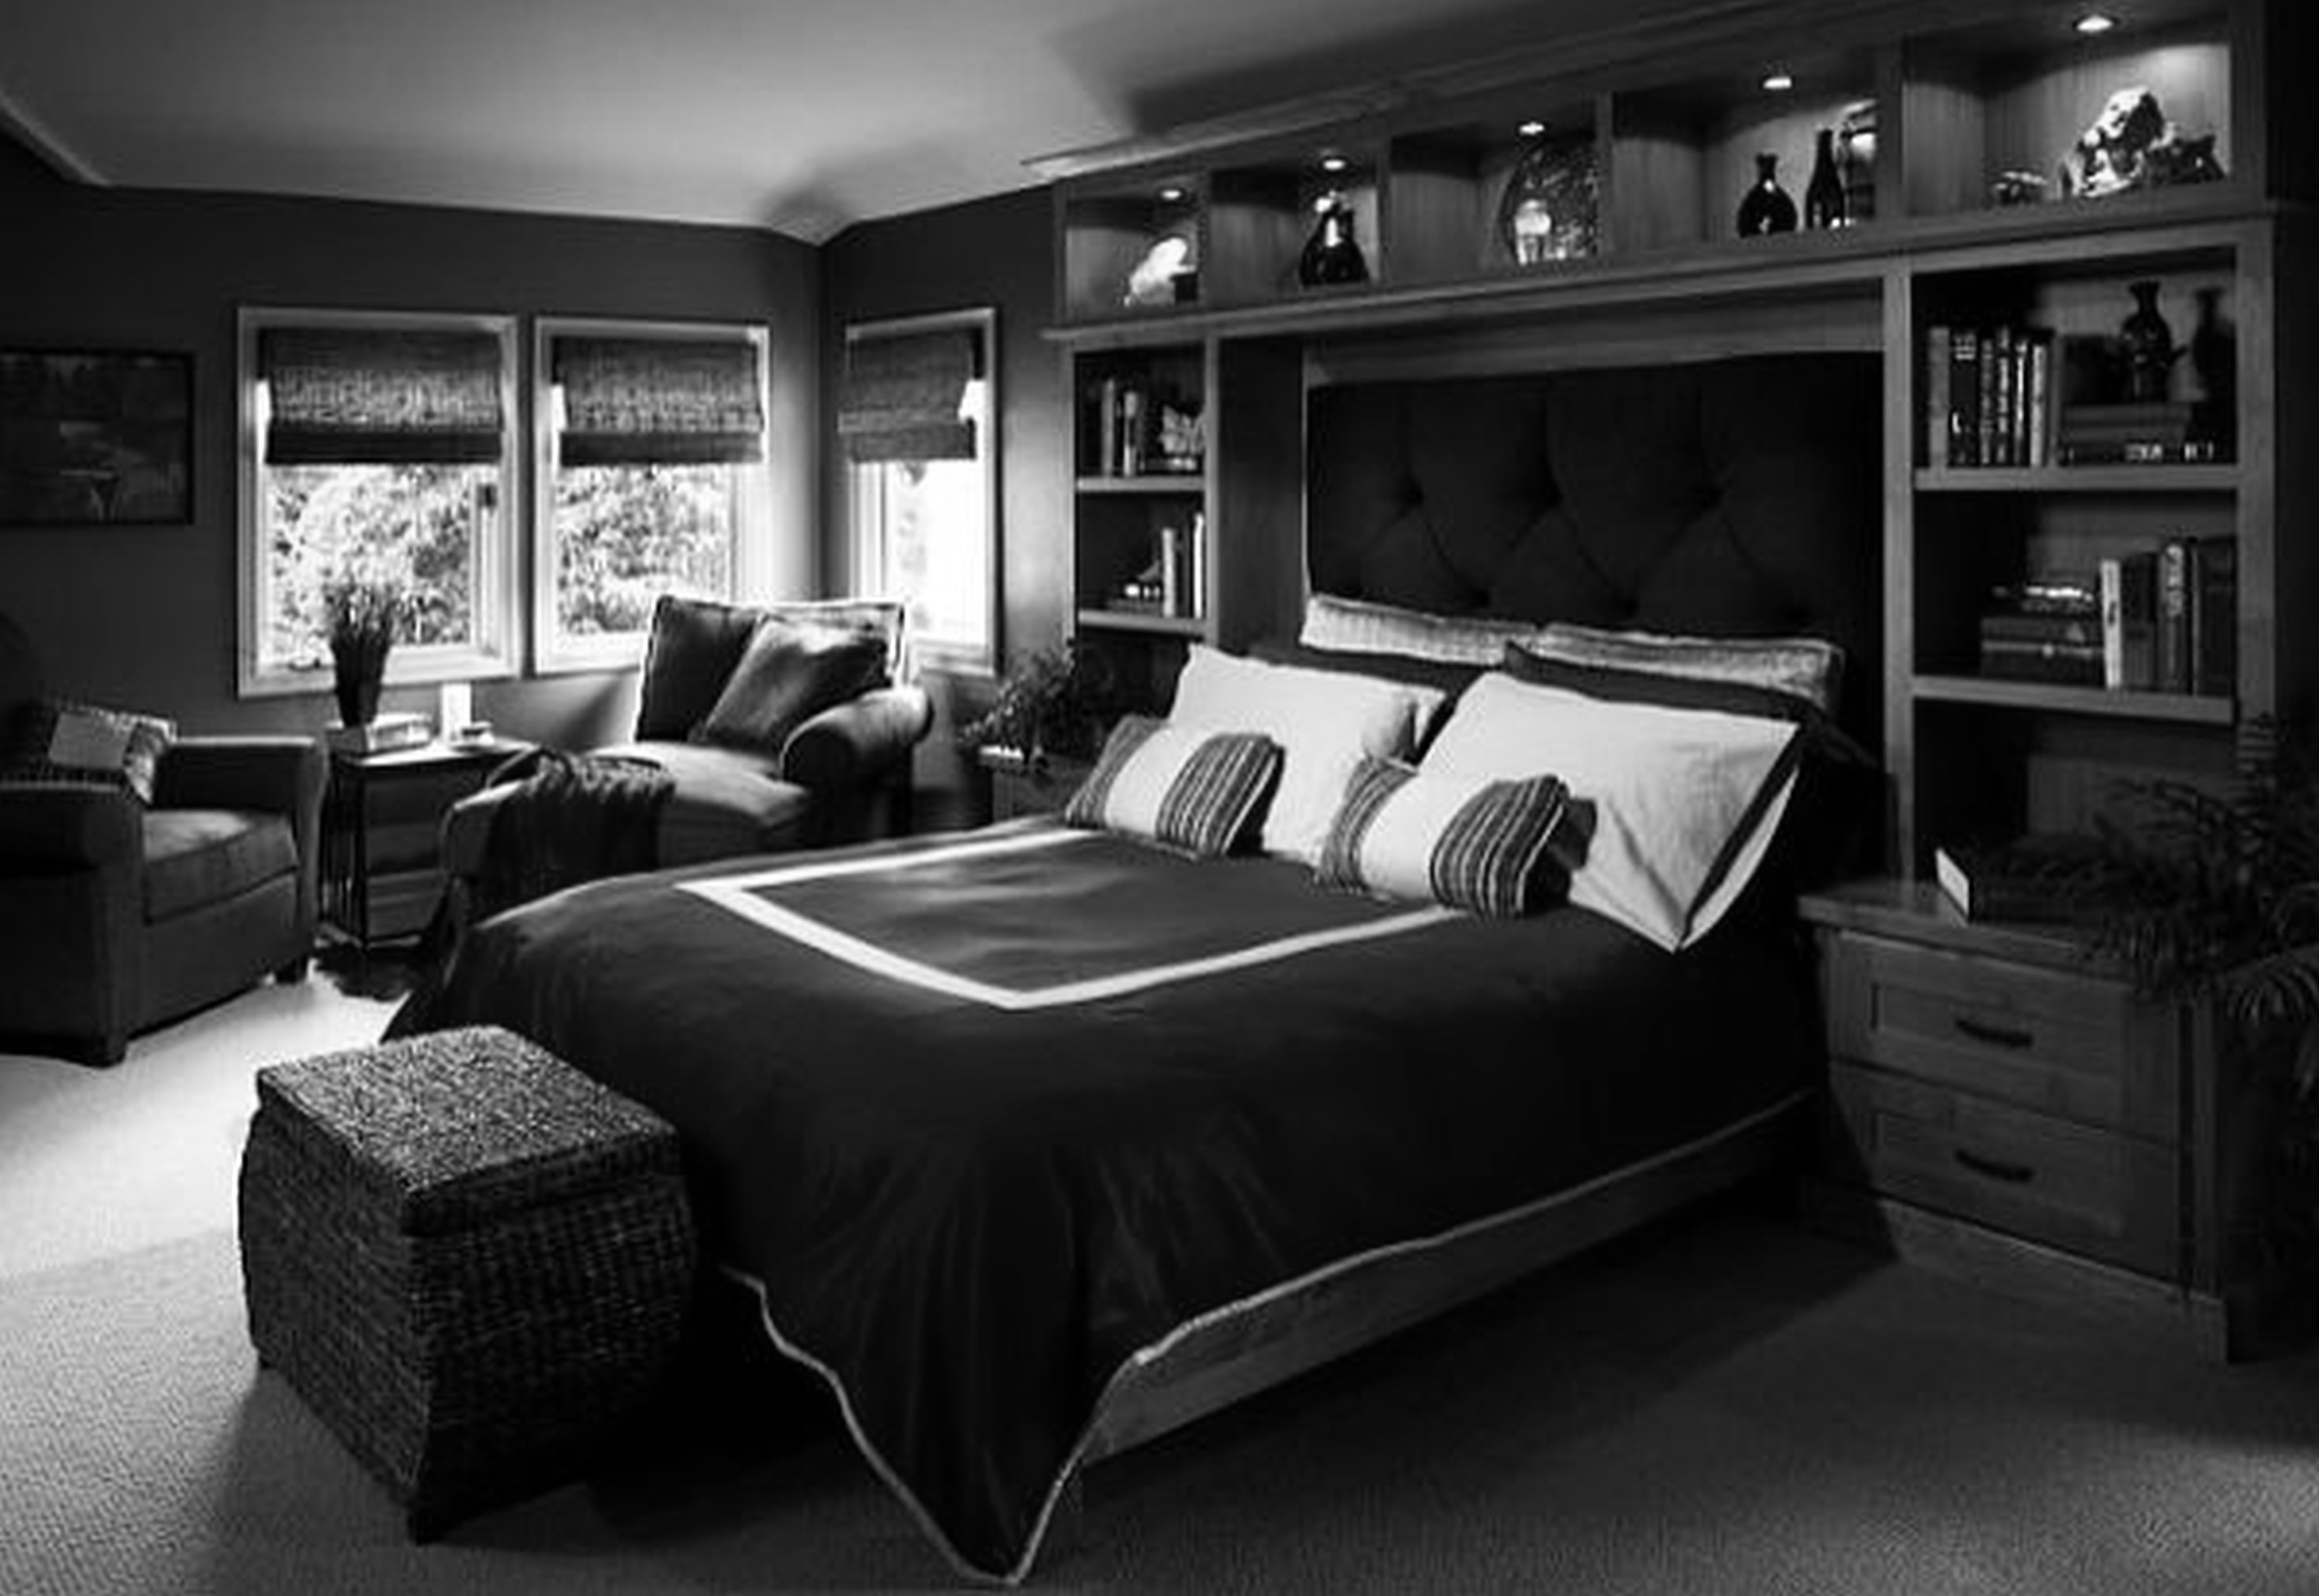 Bedroom furniture for men - Bedroom Furniture Sets For Men Yunnafurnitures Bedroom Guest Bedroom Love The Headboard Would Leave Lots Of Room For Desk And Dresser In